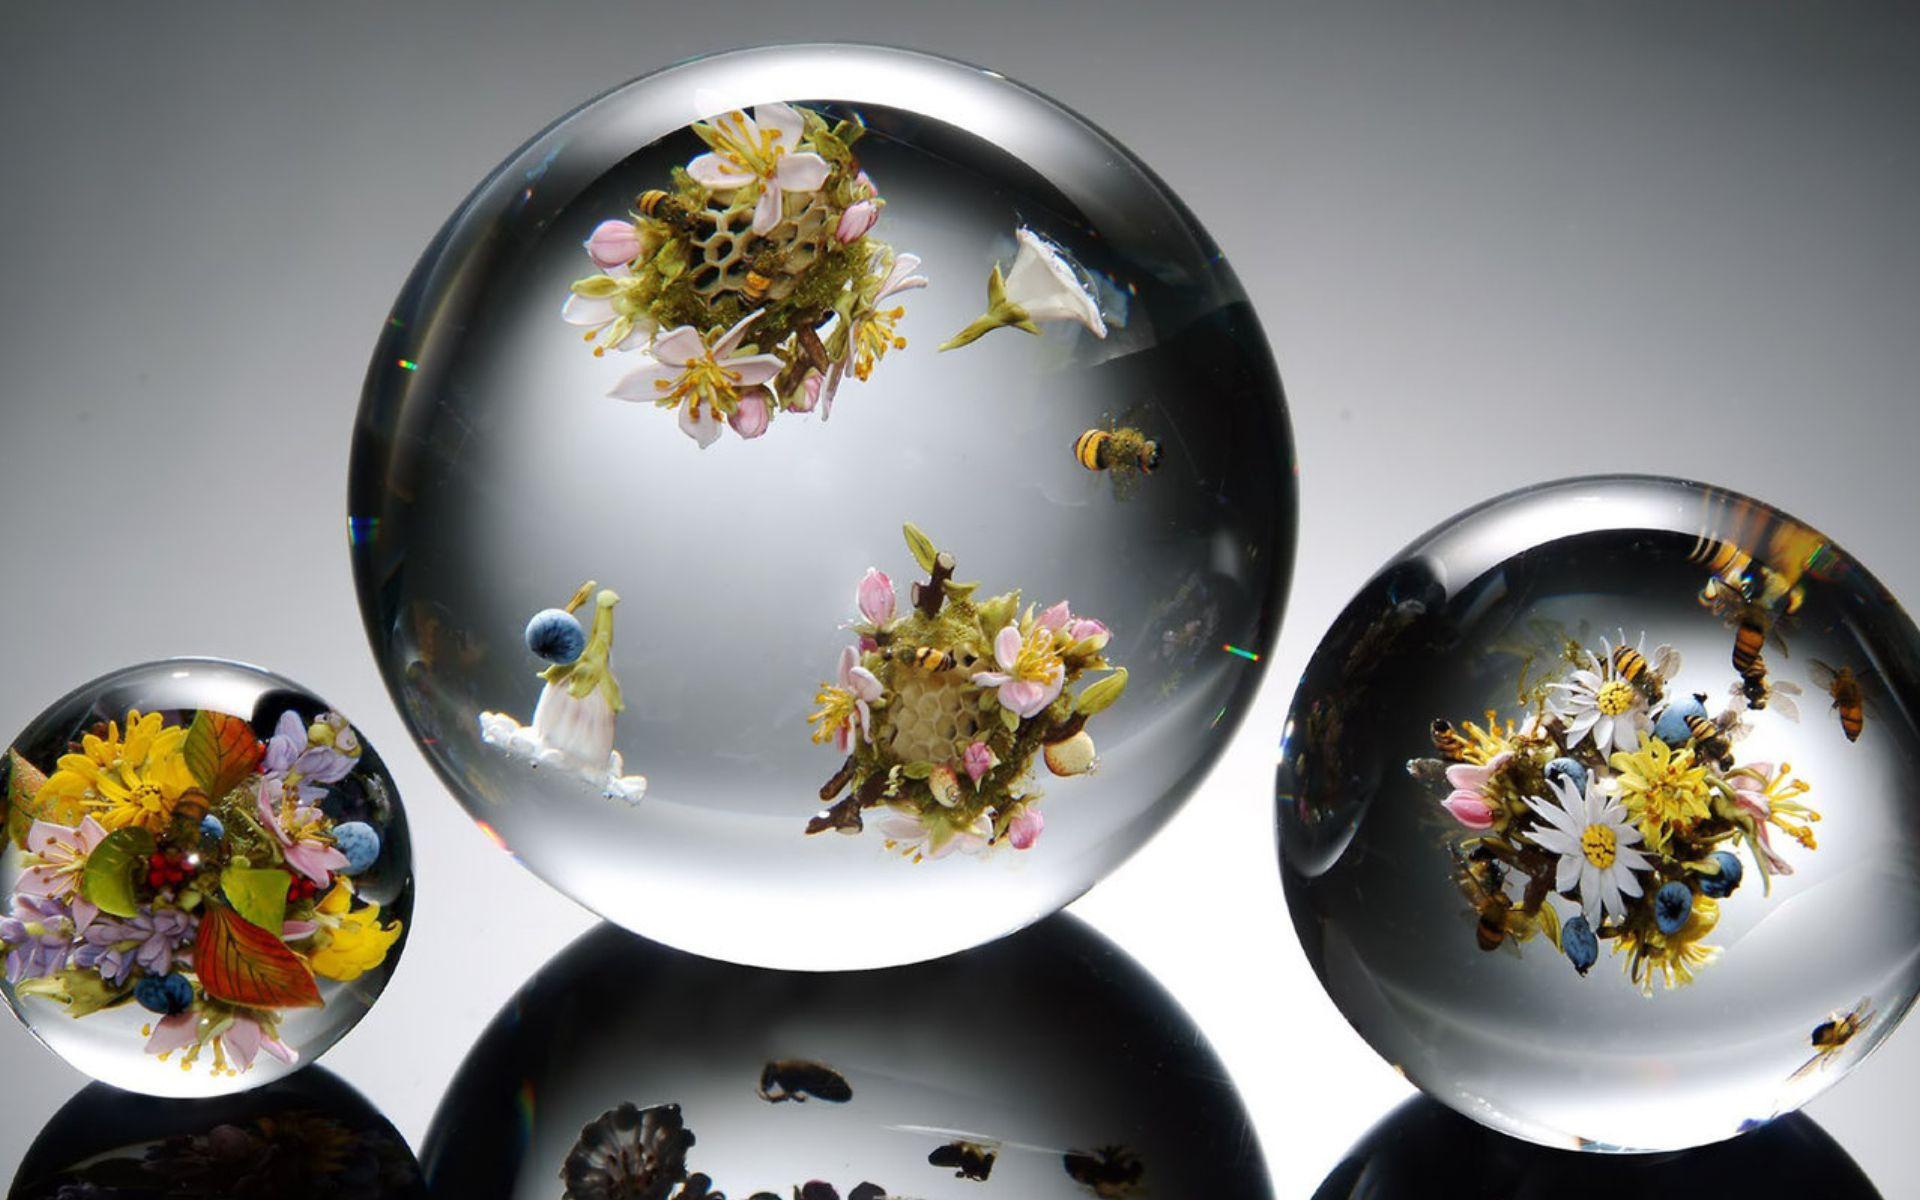 Transparent Balloons Flowers Bees Flower Glass Sphere Mood Wallpaper